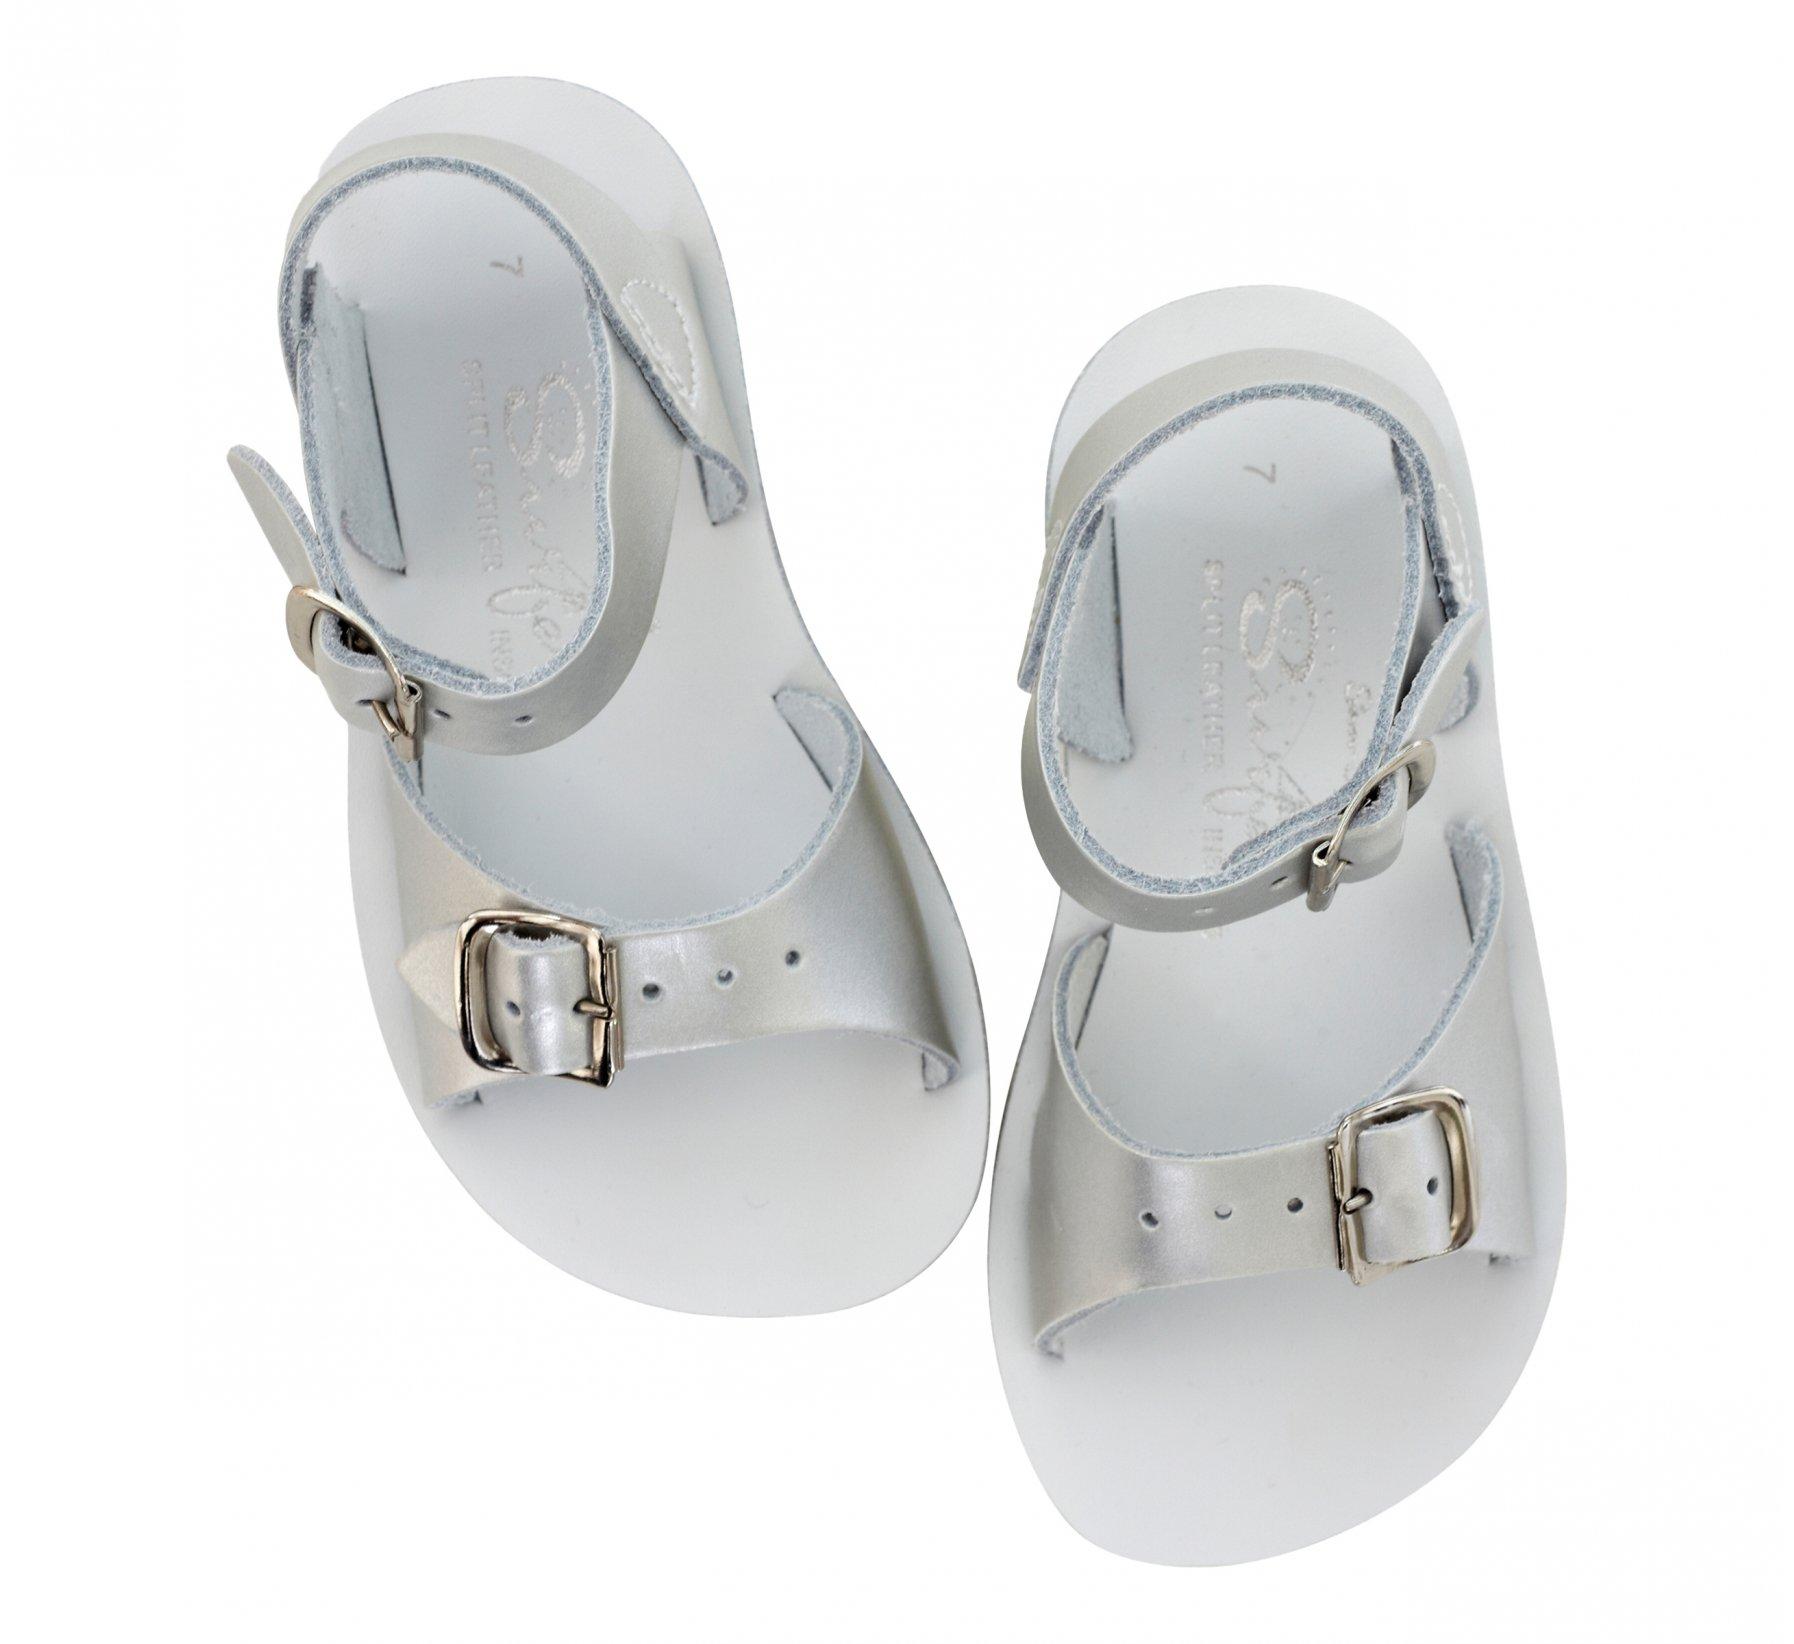 Surfer Perak - Salt Water Sandals